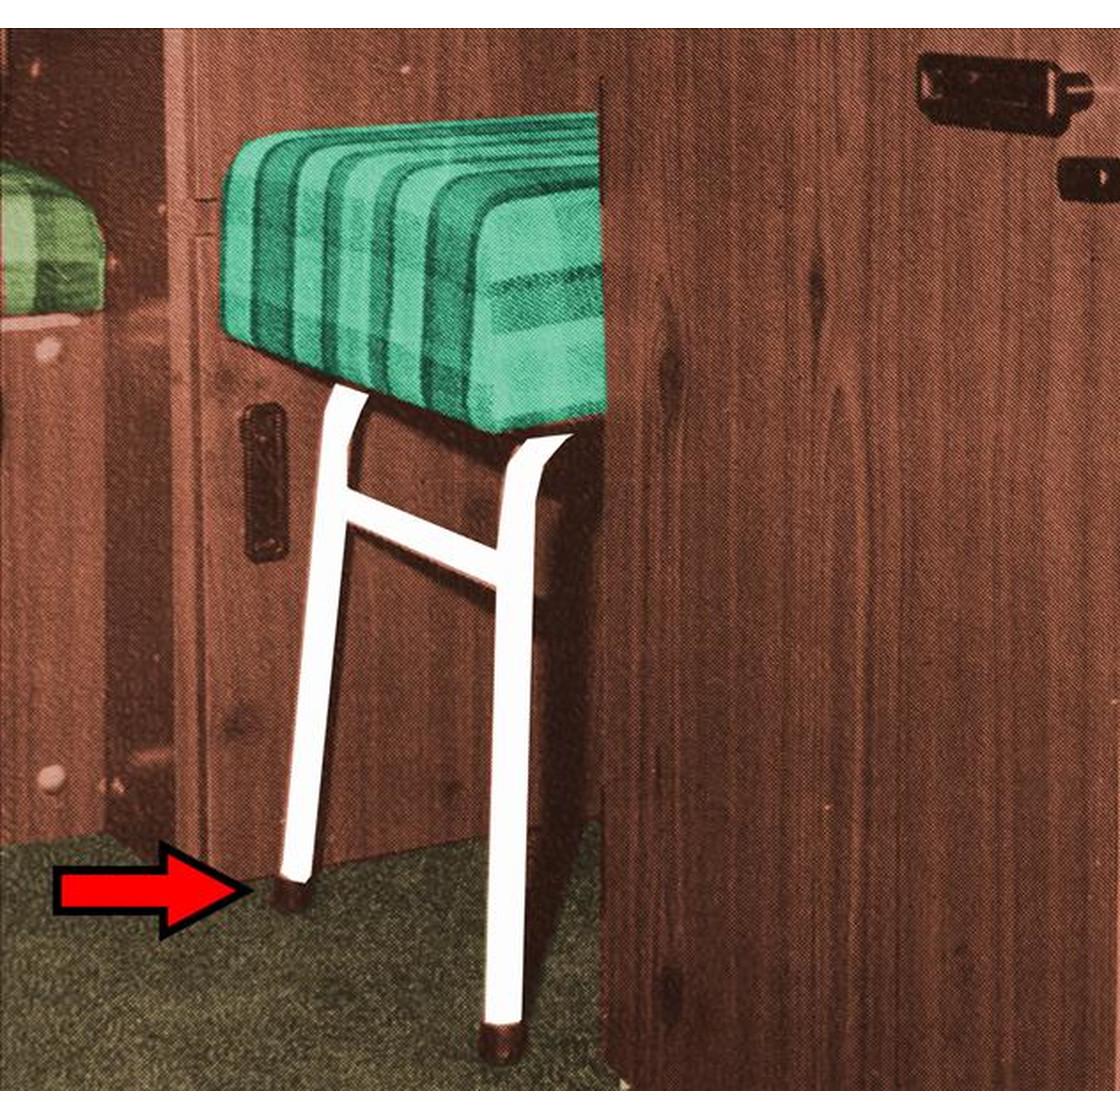 t2 h lsen f e f r westfalia hocker bus 3 40. Black Bedroom Furniture Sets. Home Design Ideas